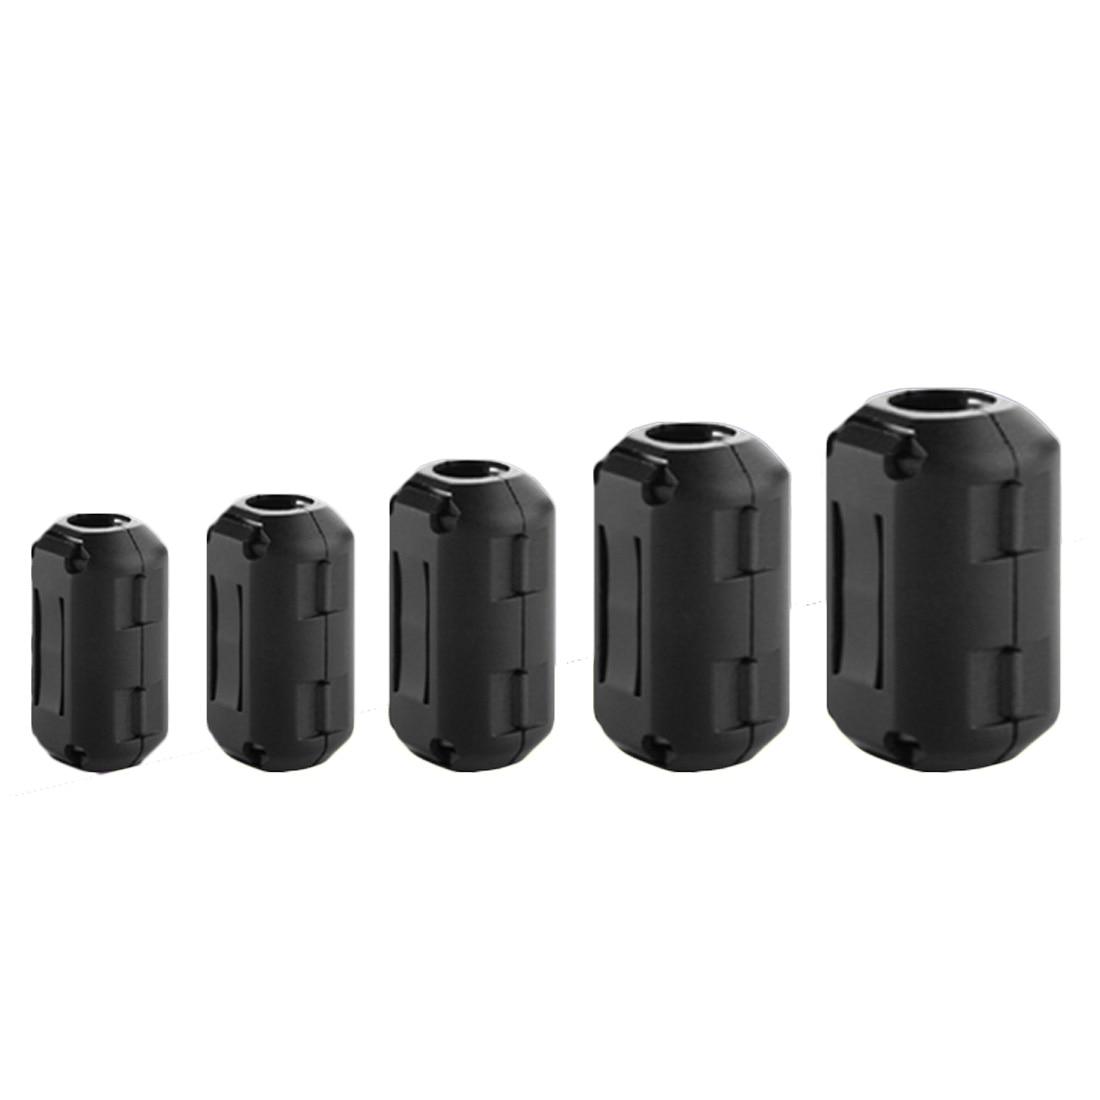 New 3.5mm 5pcs Black Ferrite Core Cable Filter Nickel-zinc Noise Suppressor for EMI RFI Clip Choke Ferrite Filters